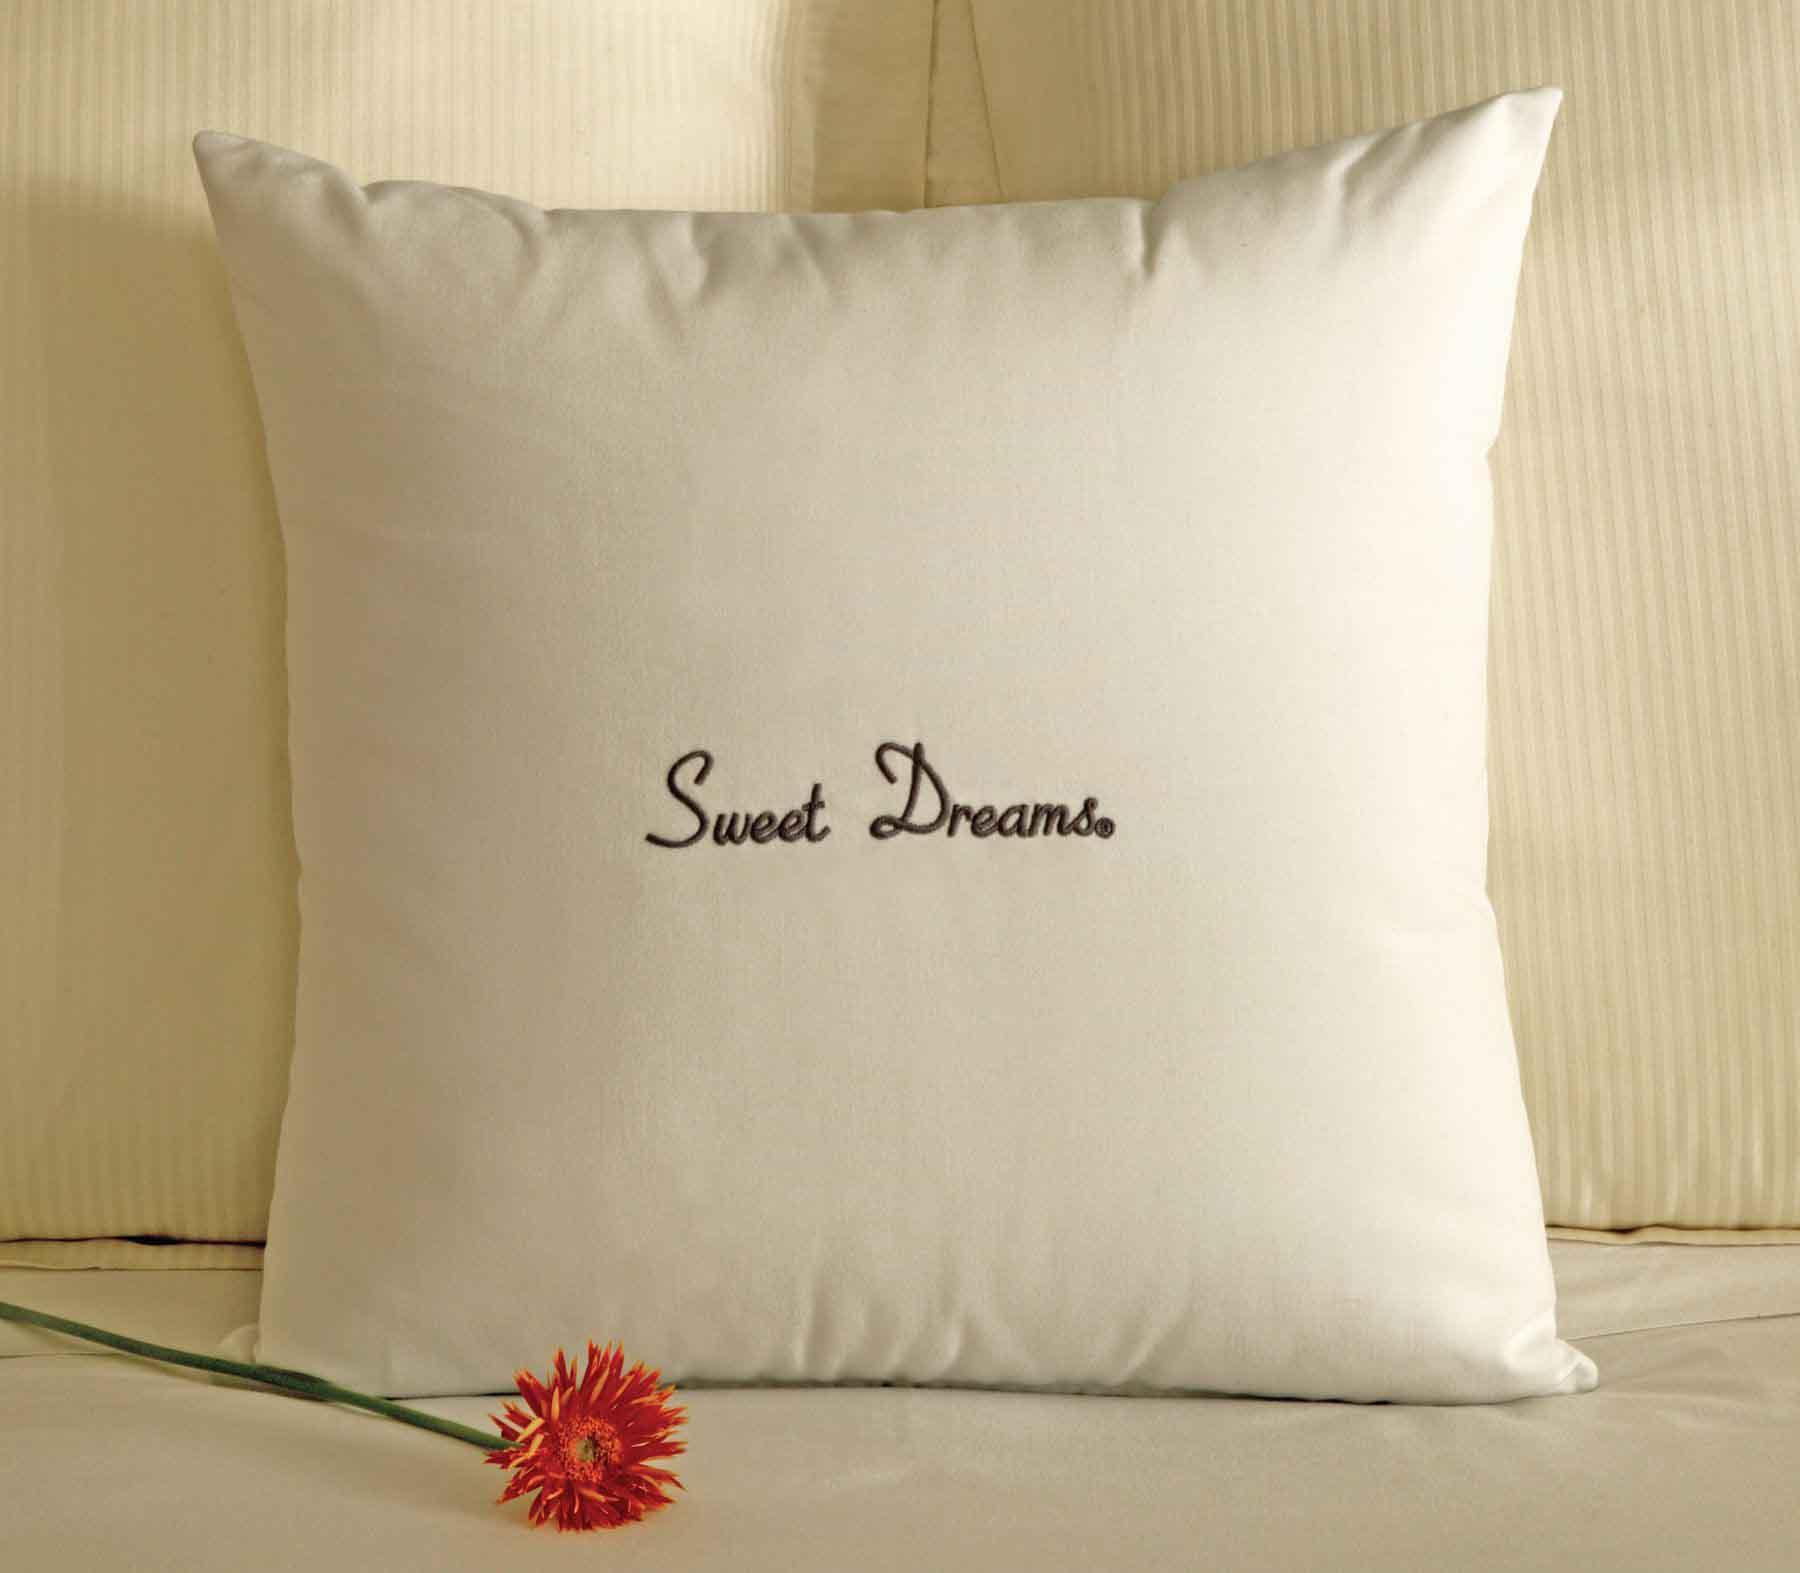 Ảnh sweet dream